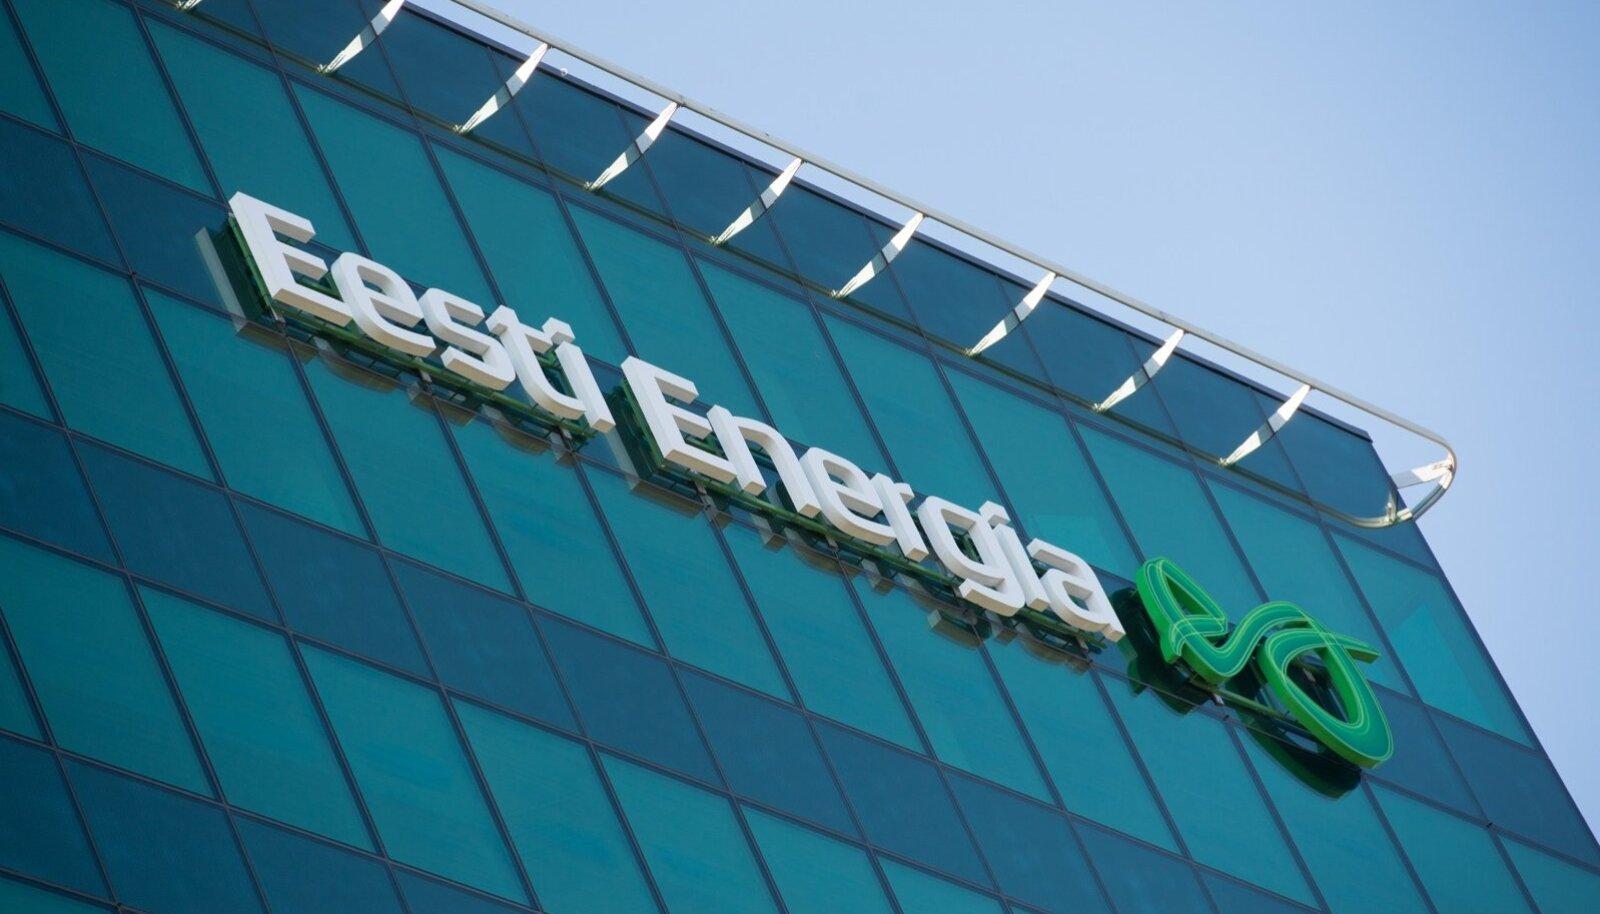 Eesti Energia logo